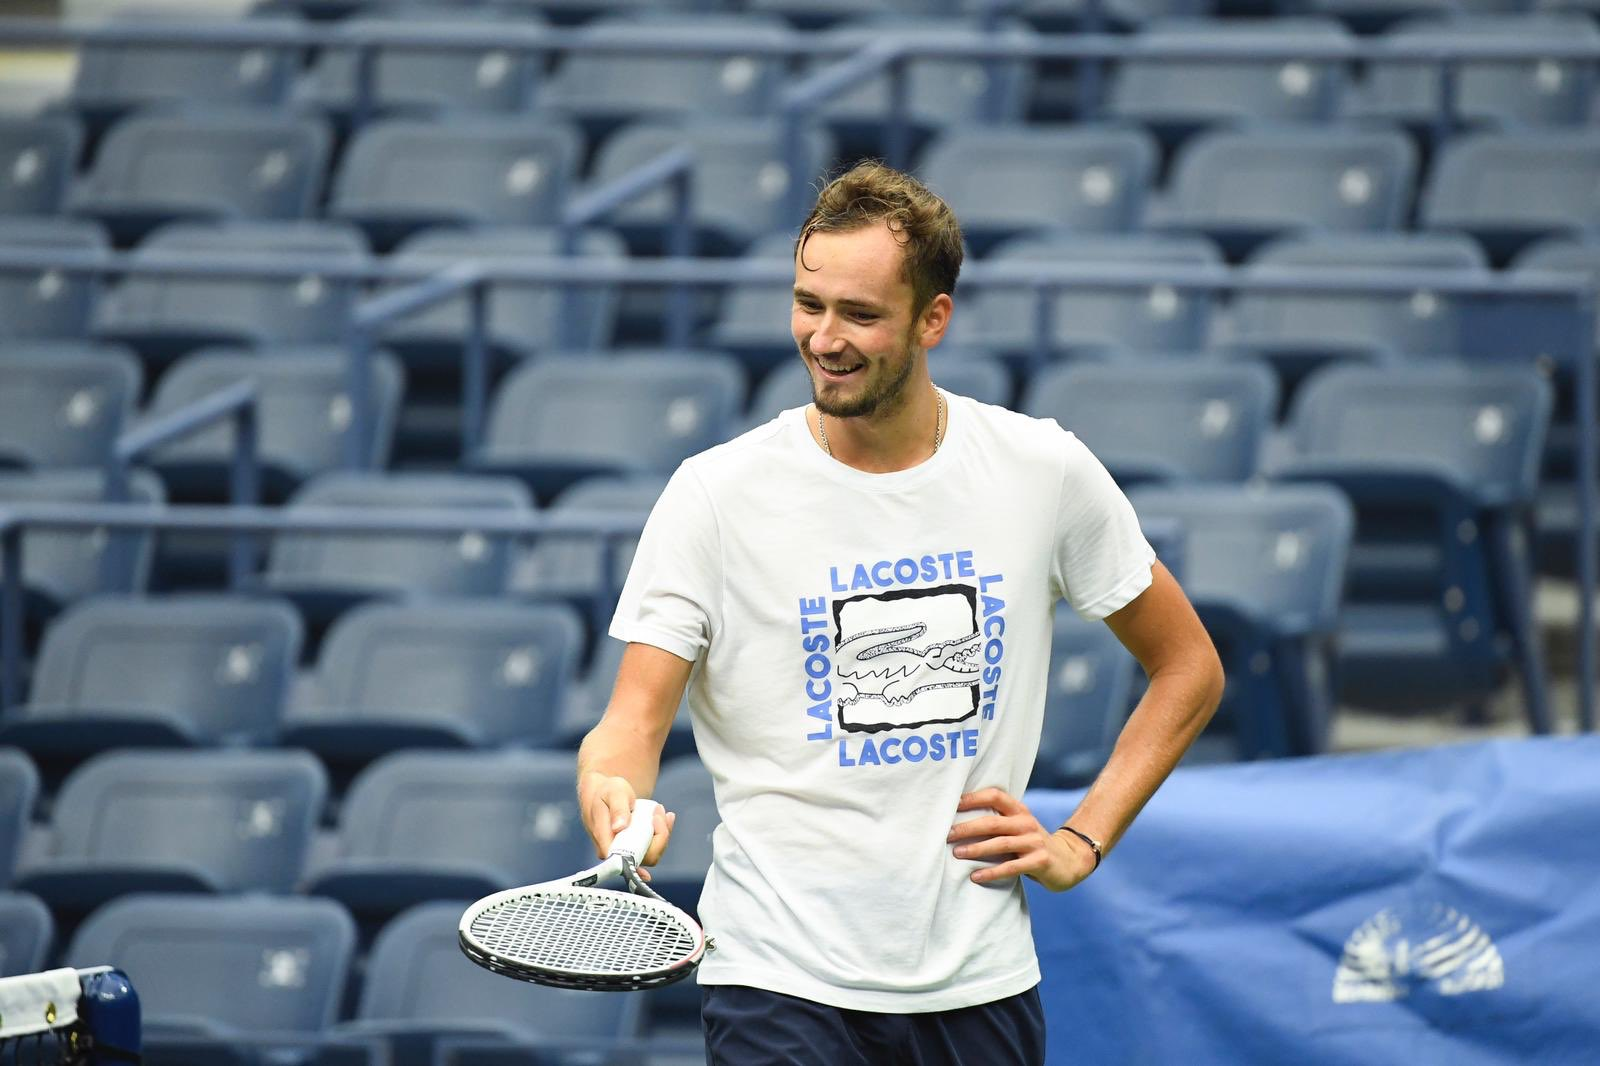 Американский теннисист показал Даниилу Медведеву средний палец